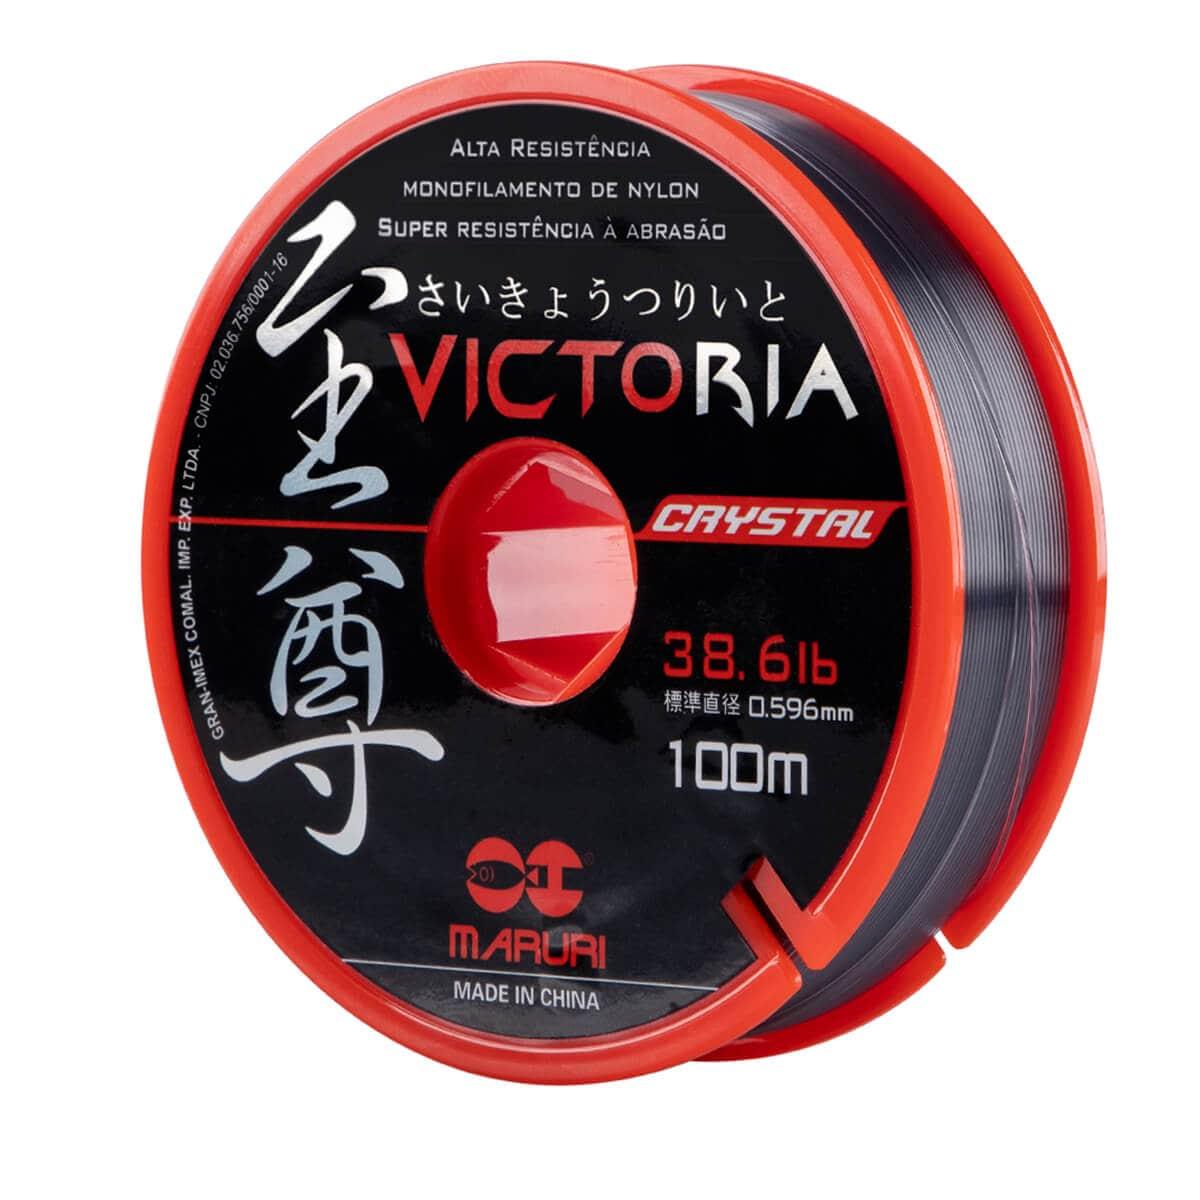 Linha Monofilamento Maruri Victoria Crystal 0,496mm 28lb 100m